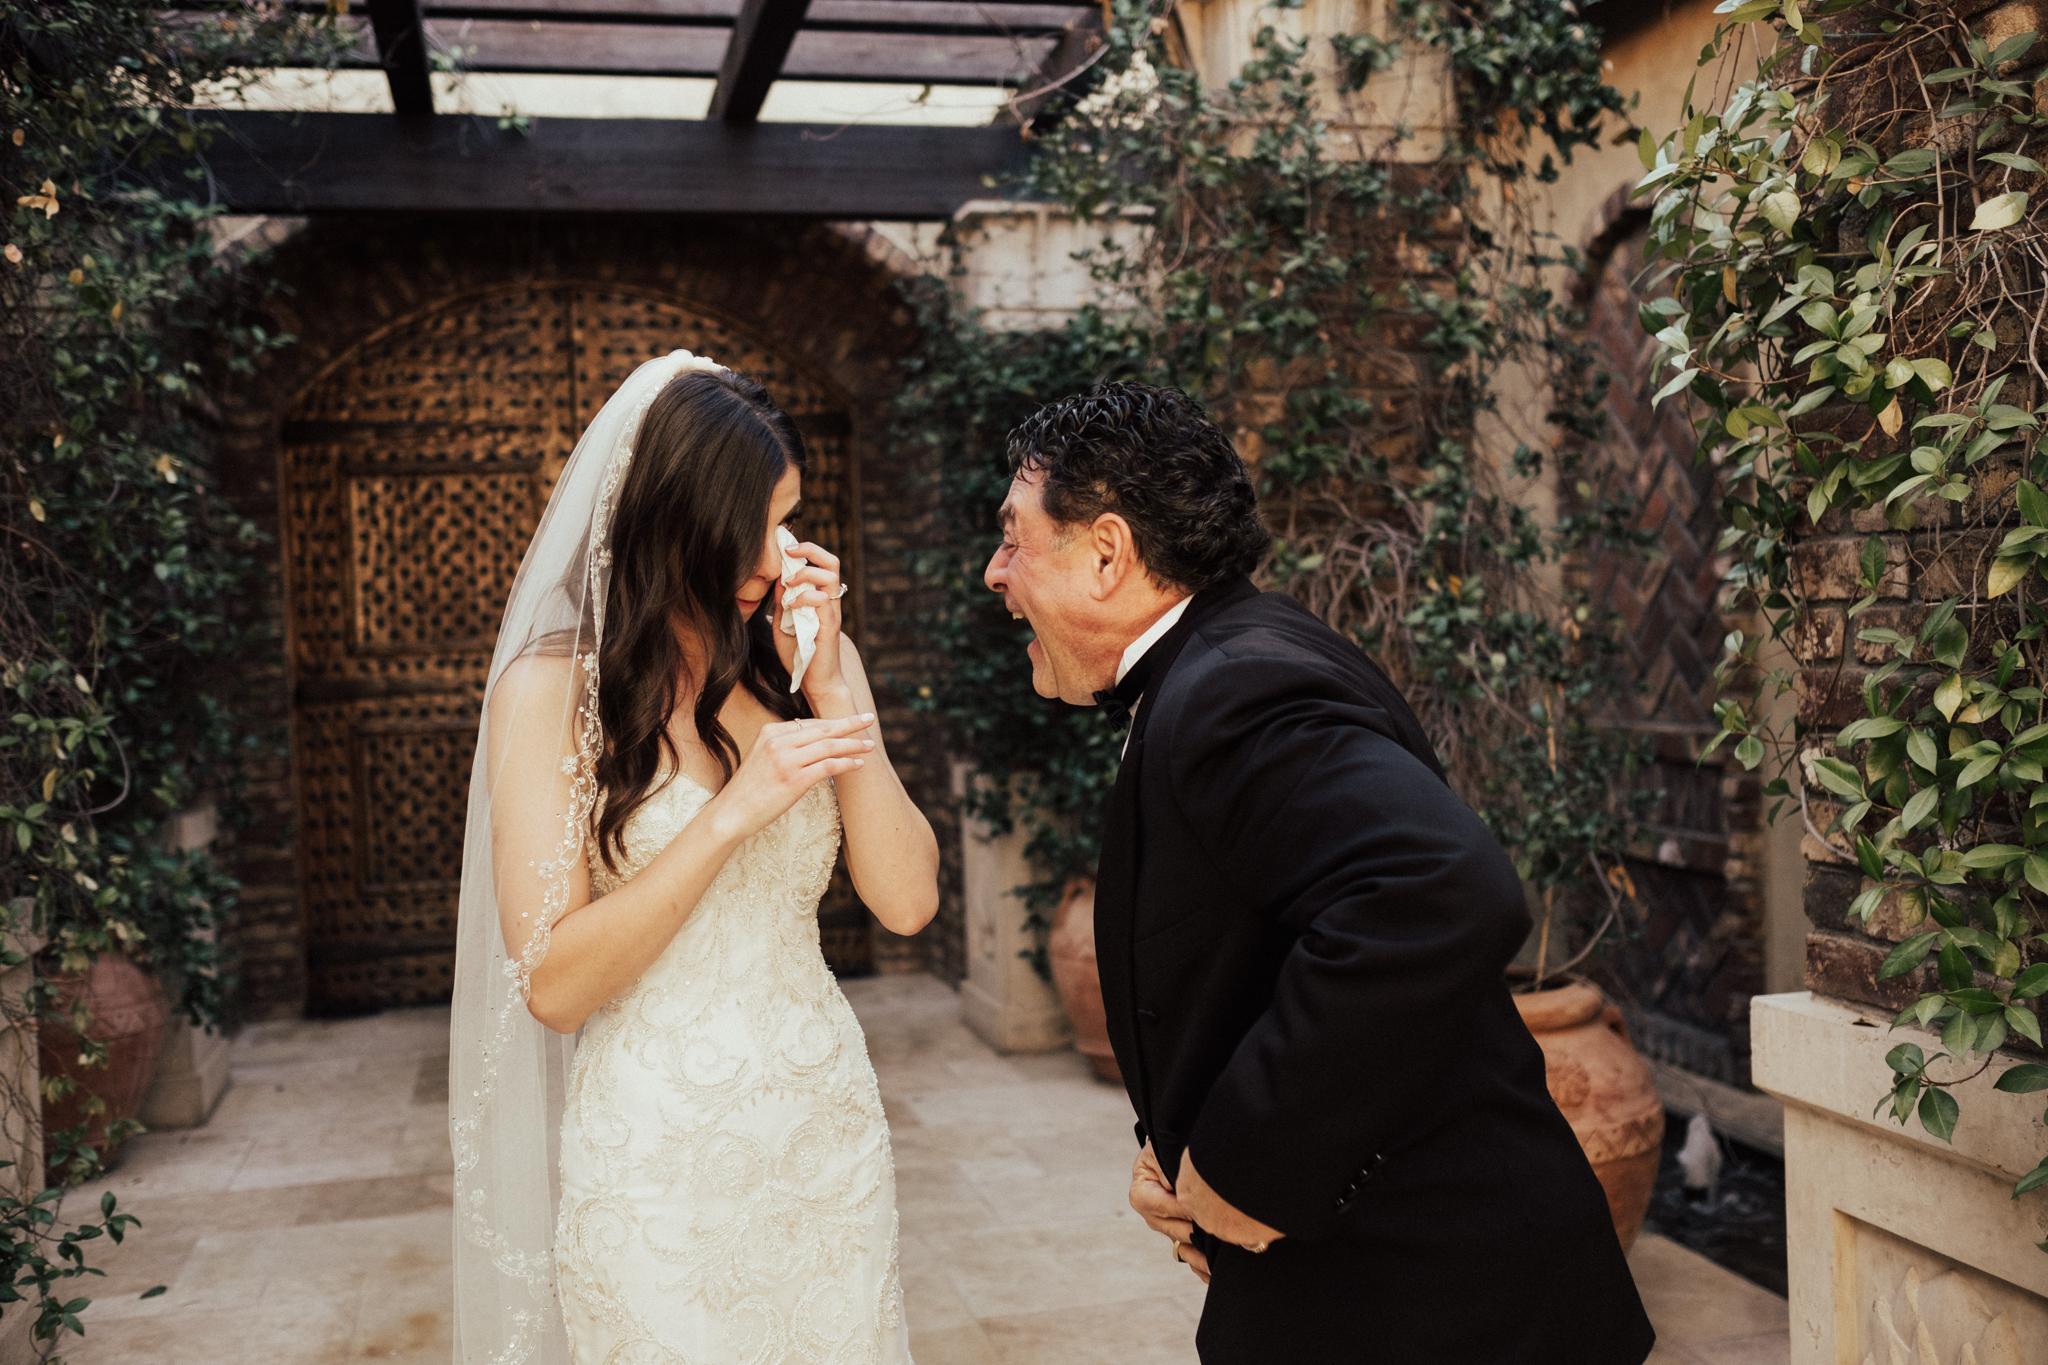 Arizona-Adventure-Elopement-Wedding-Photographer-134.jpg